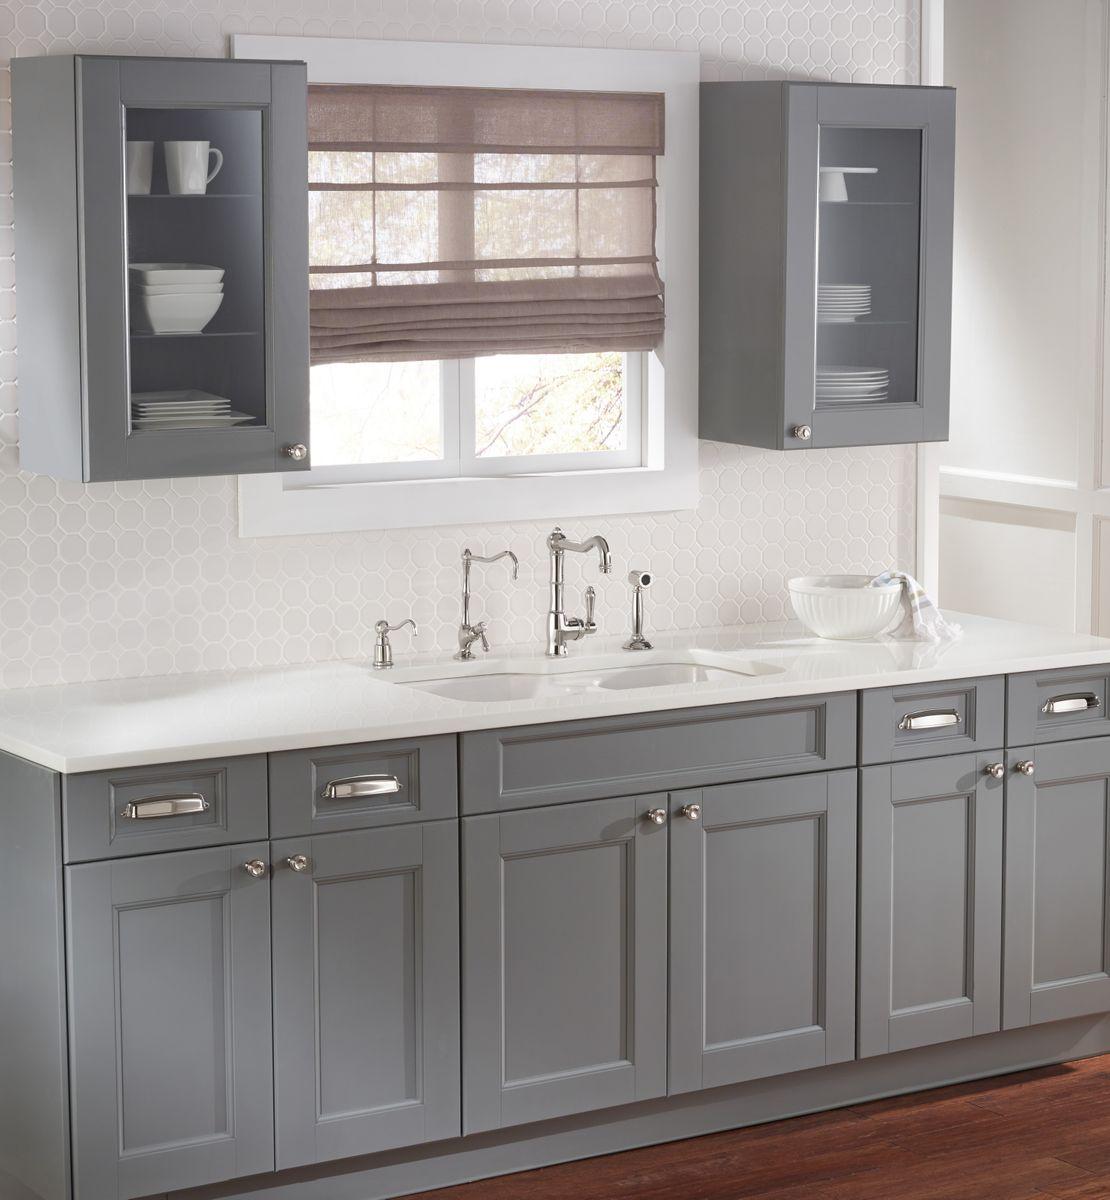 ROHL® Water Appliance™ - Suburban Splendor